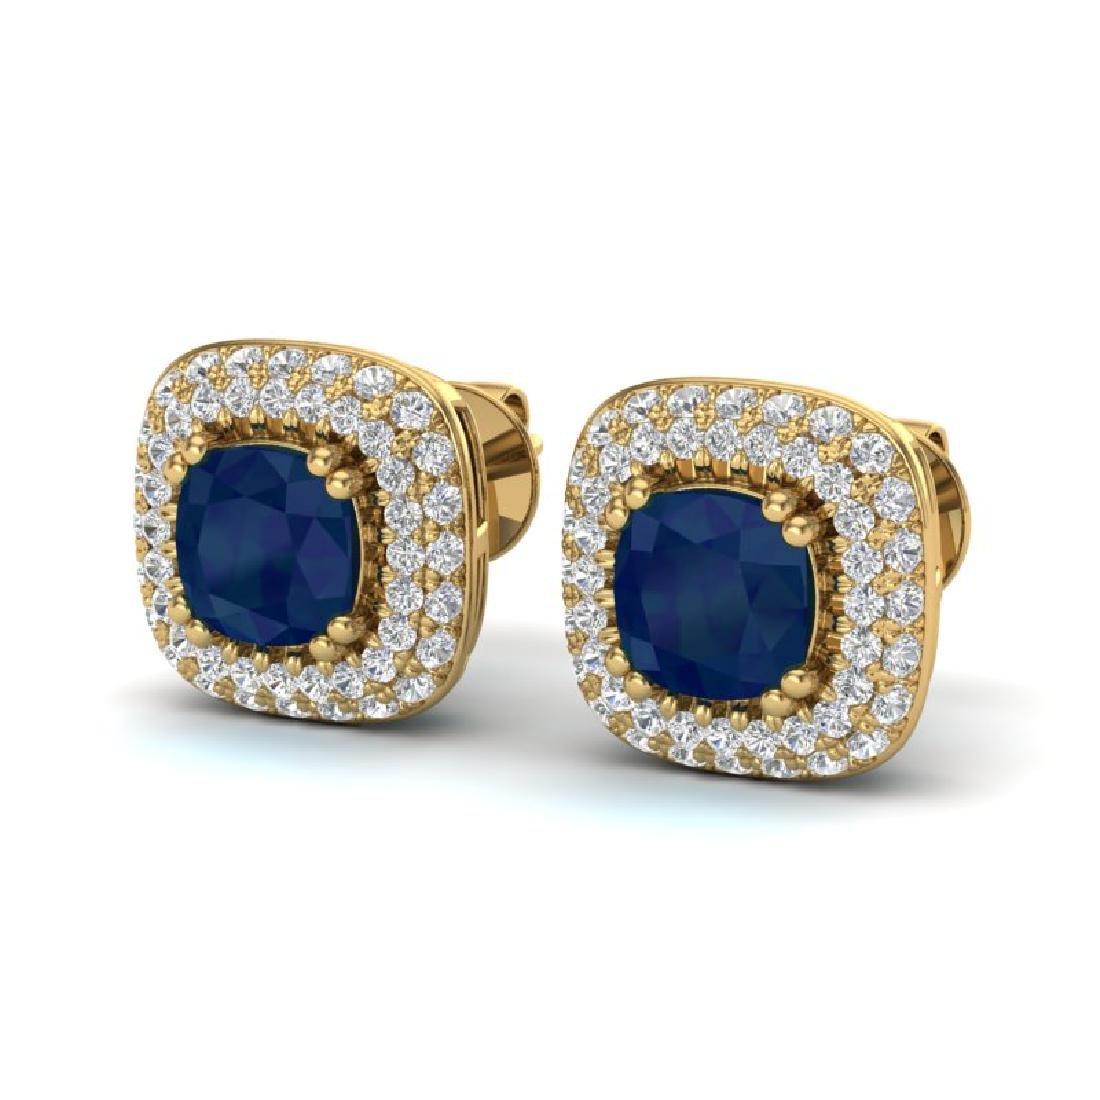 2.16 CTW Sapphire & Micro VS/SI Diamond Earrings Halo